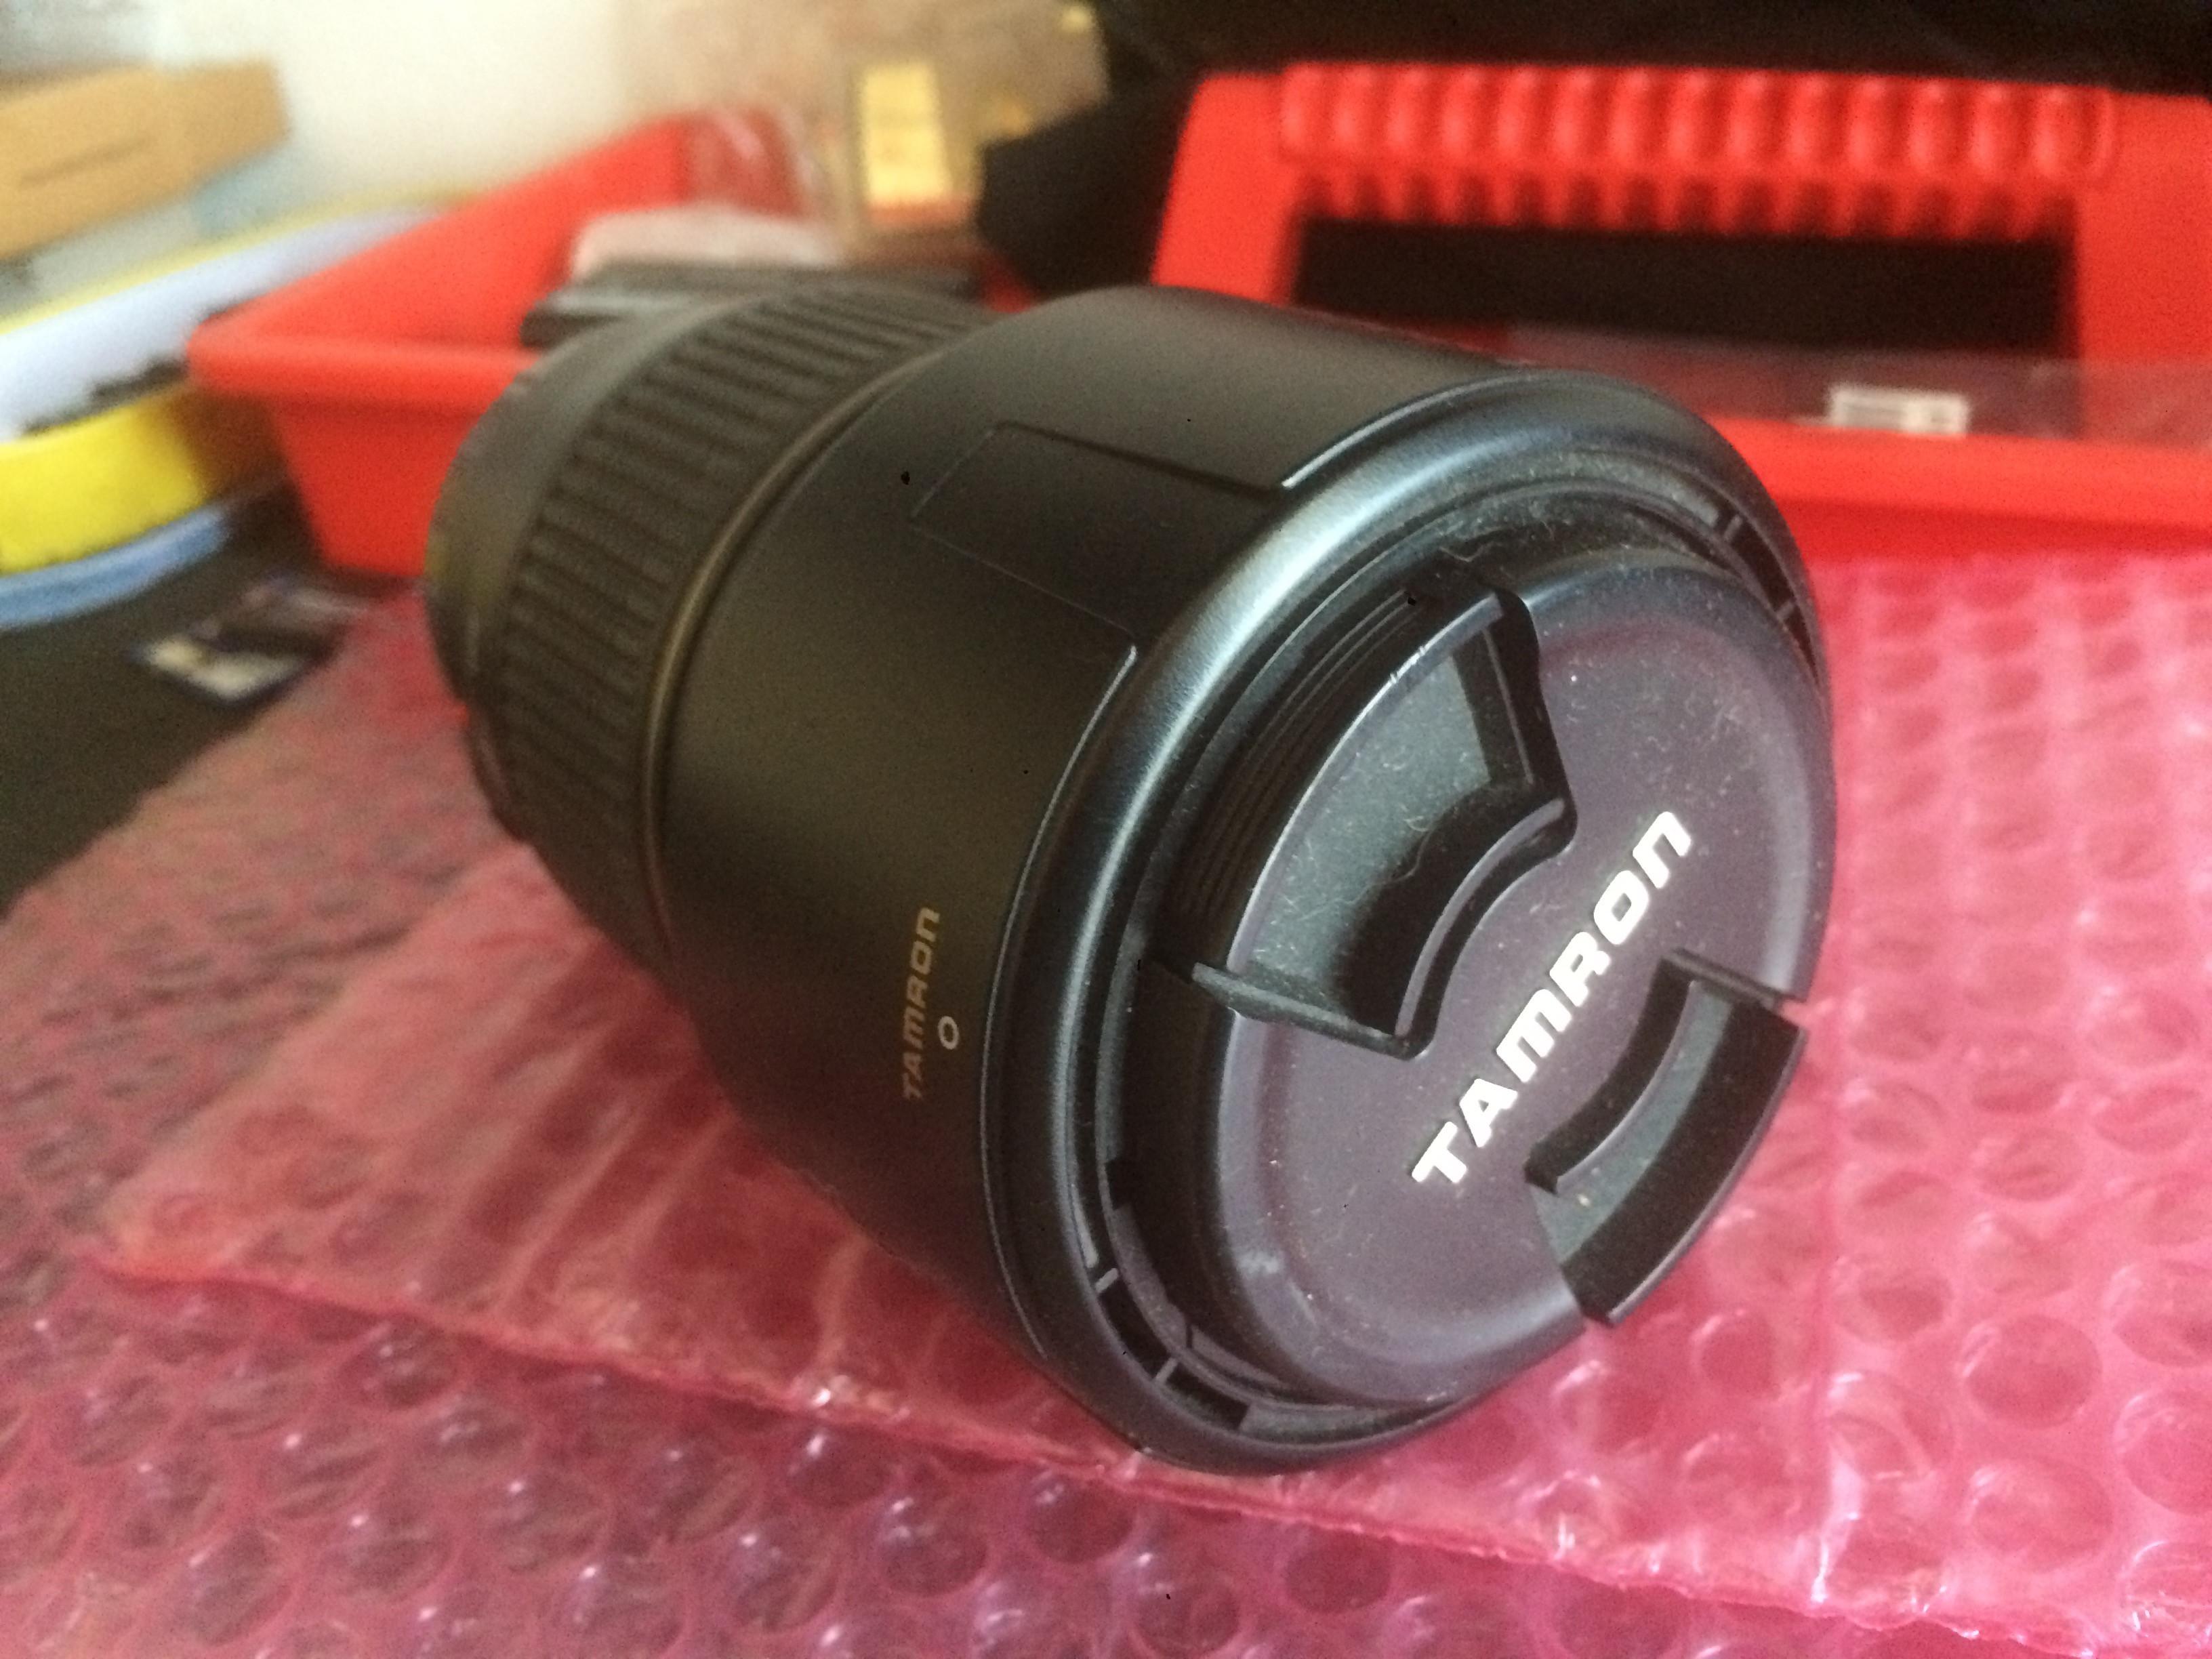 Tamron 70/200 monture canon